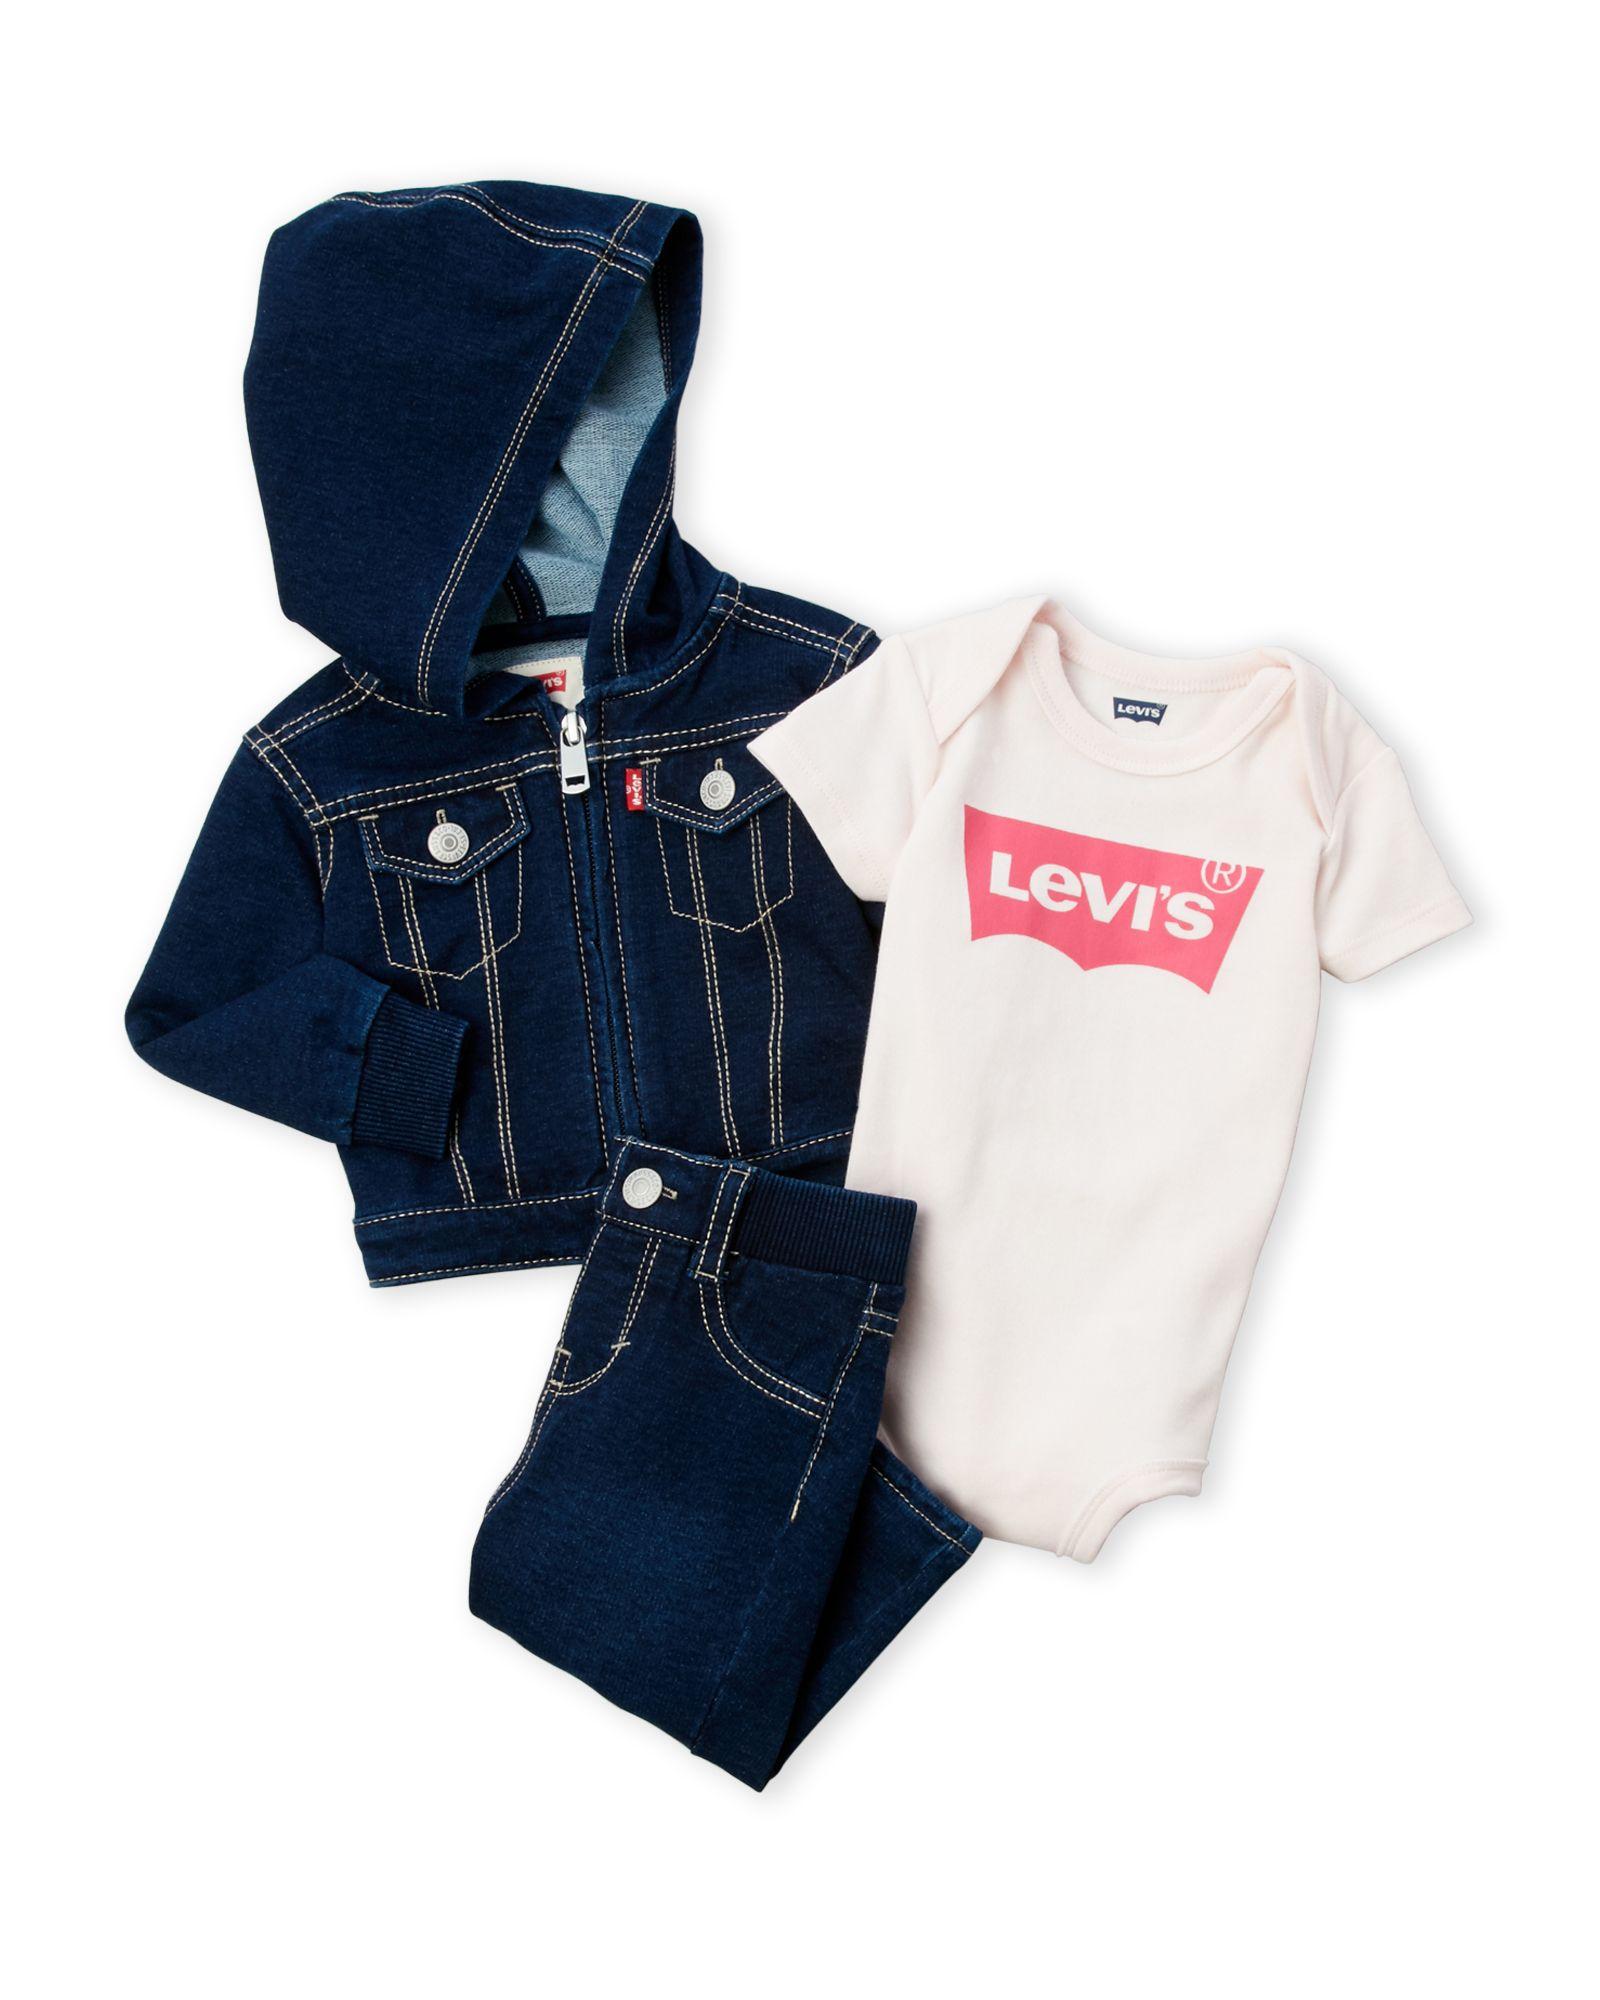 Levi S Newborn Infant Girls 3 Piece Denim Box Set Baby Clothes Denim Clothes [ 2000 x 1600 Pixel ]